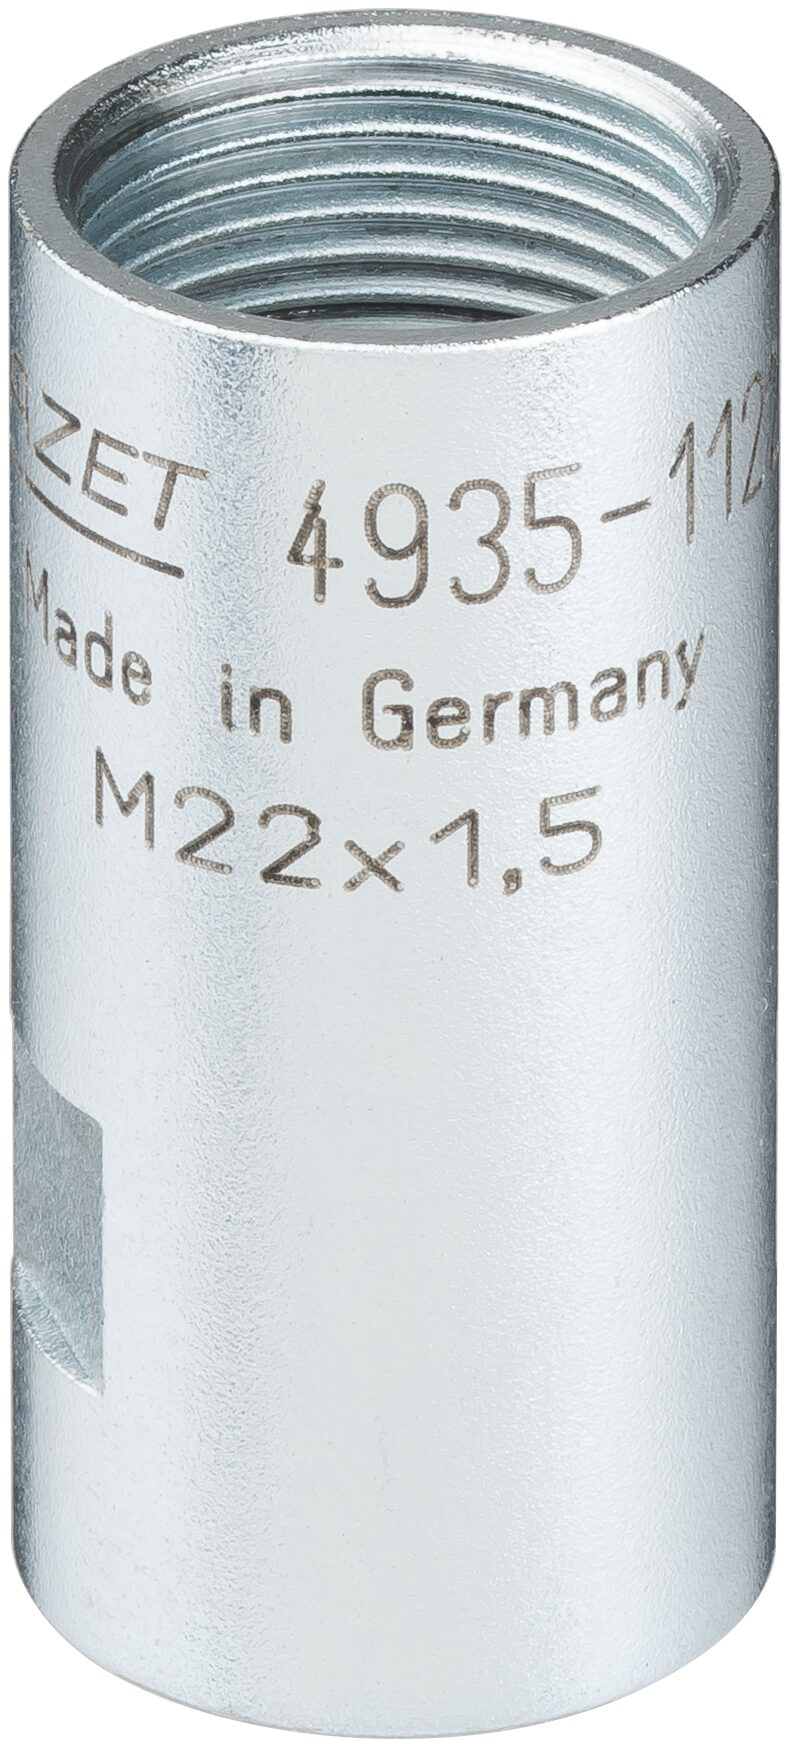 HAZET Ausziehhülse M22x1,5 4935-1122